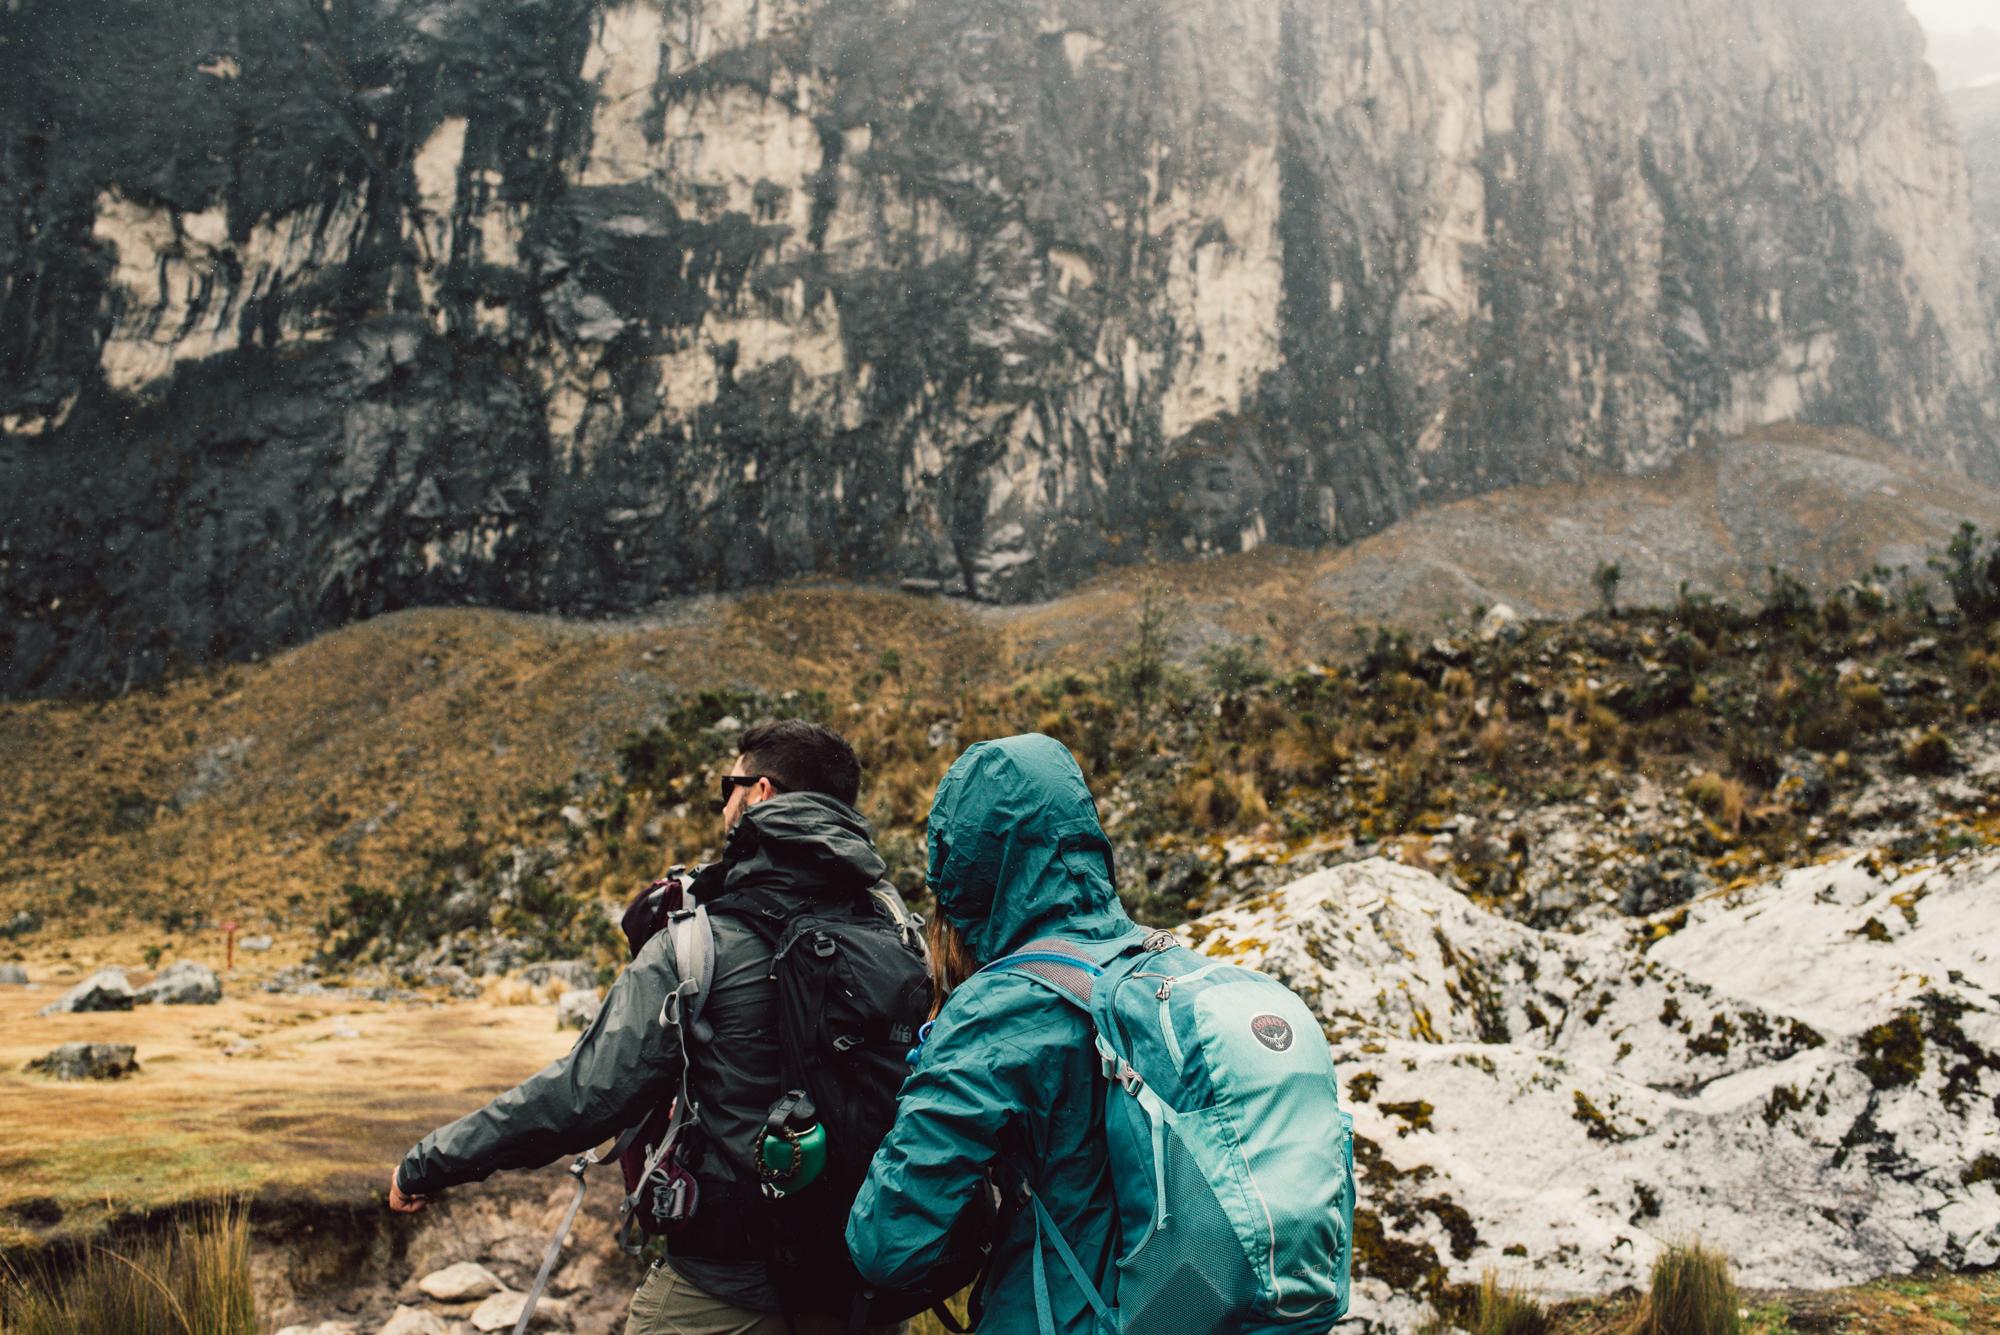 Damian and Jesse Engagement Session Huayhuash Mountain Trekking Peru_97.JPG